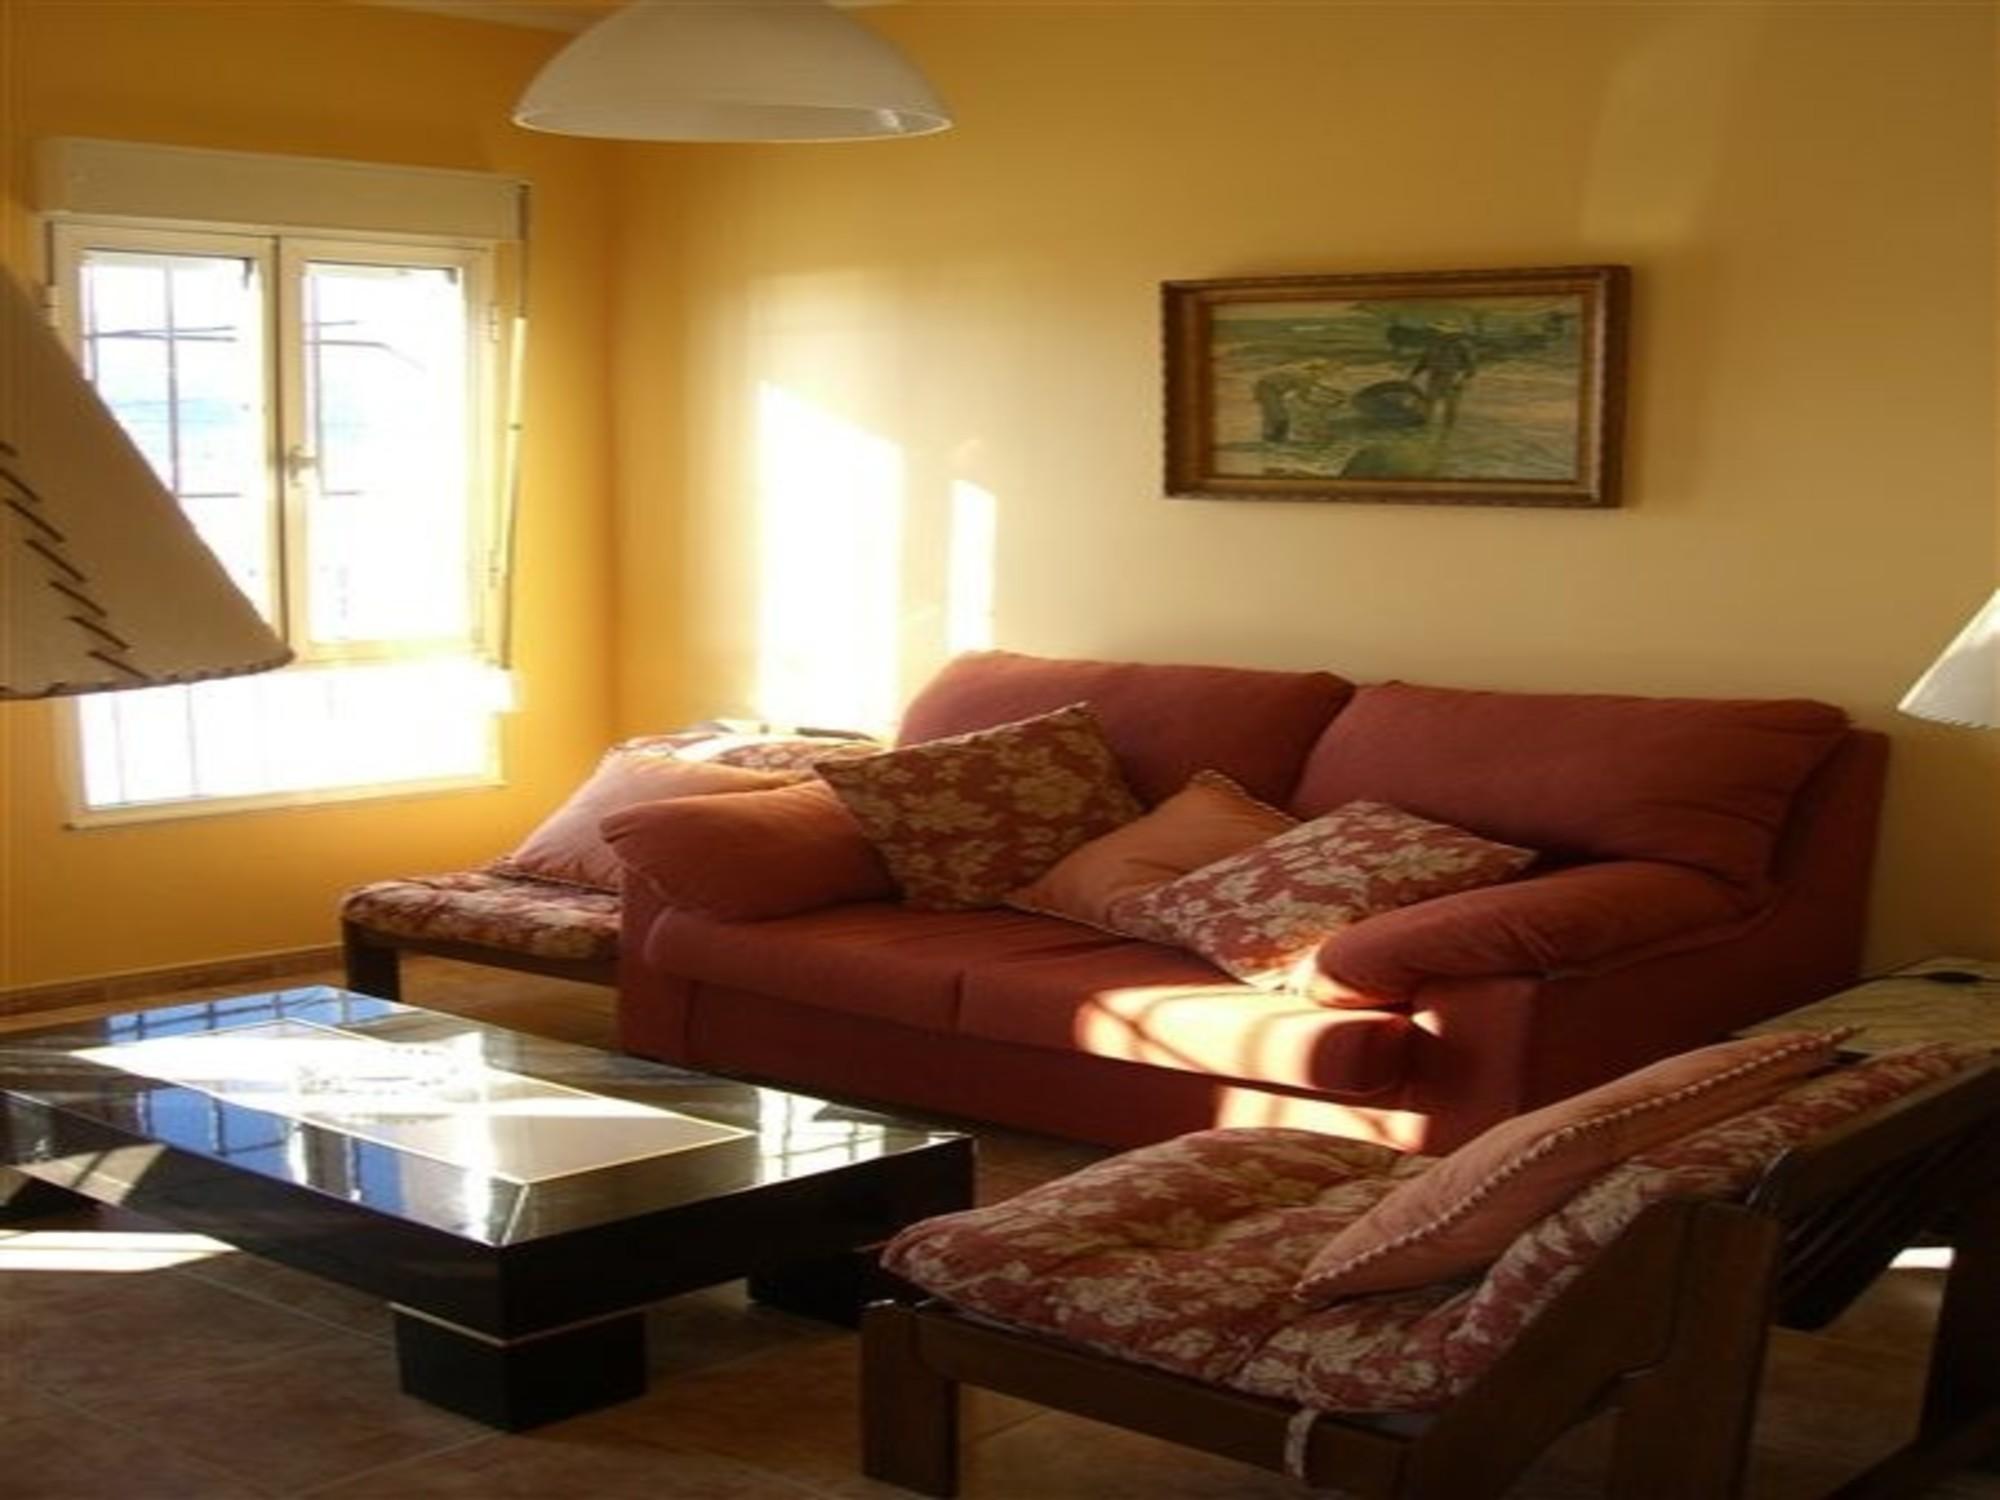 Ferienwohnung Apartment - 2 Bedrooms - 100119 (1937591), Vigo, Rias Bajas, Galicien, Spanien, Bild 2